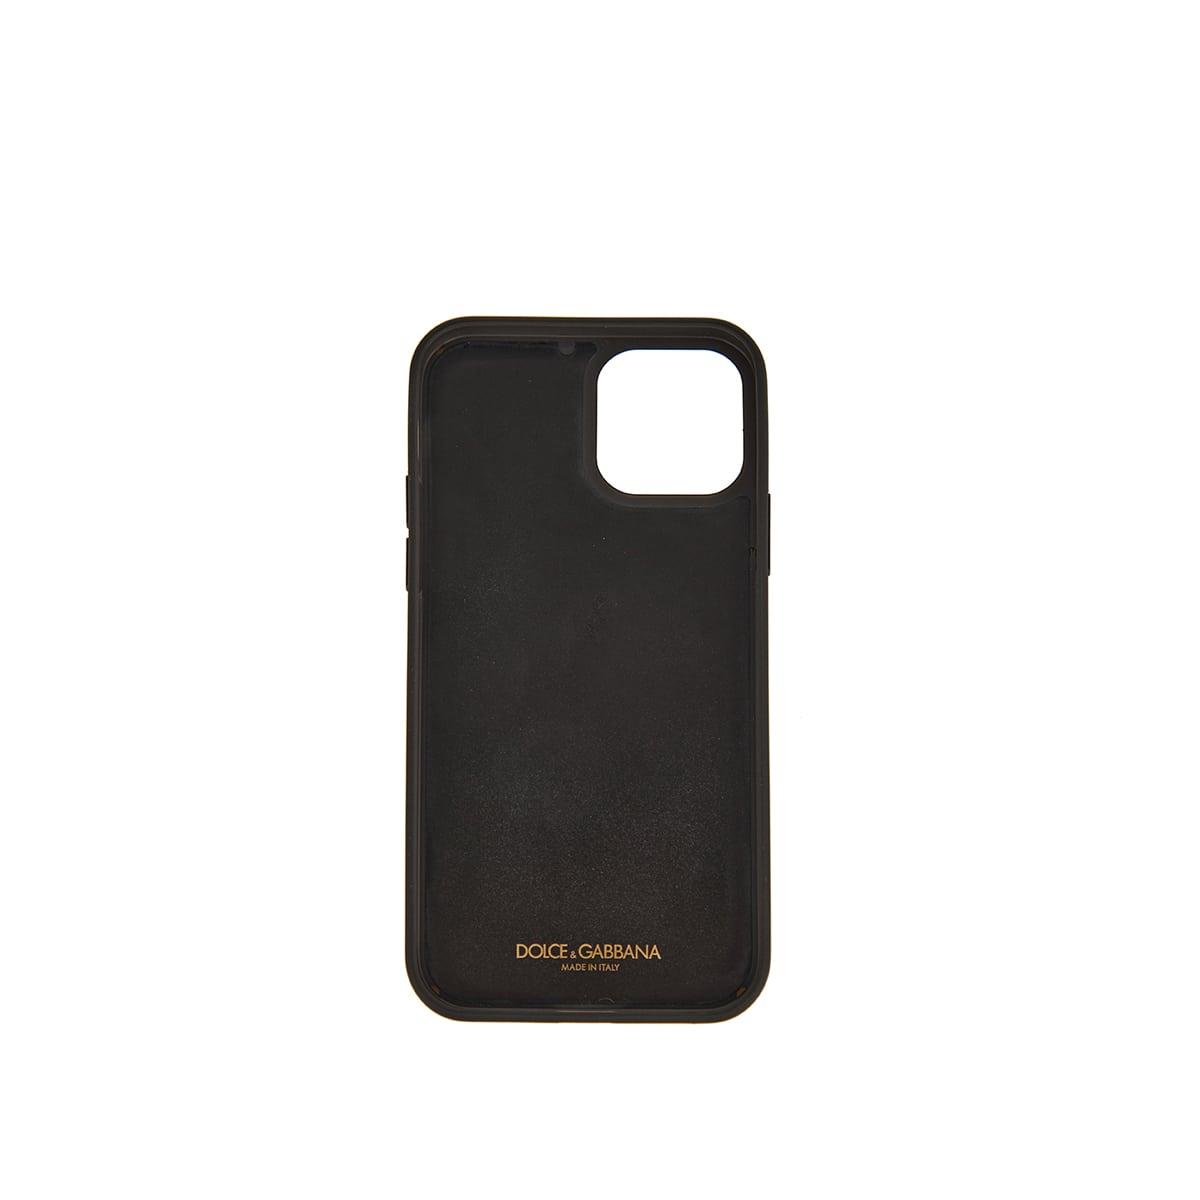 Leopard-print iPhone 12 Pro case